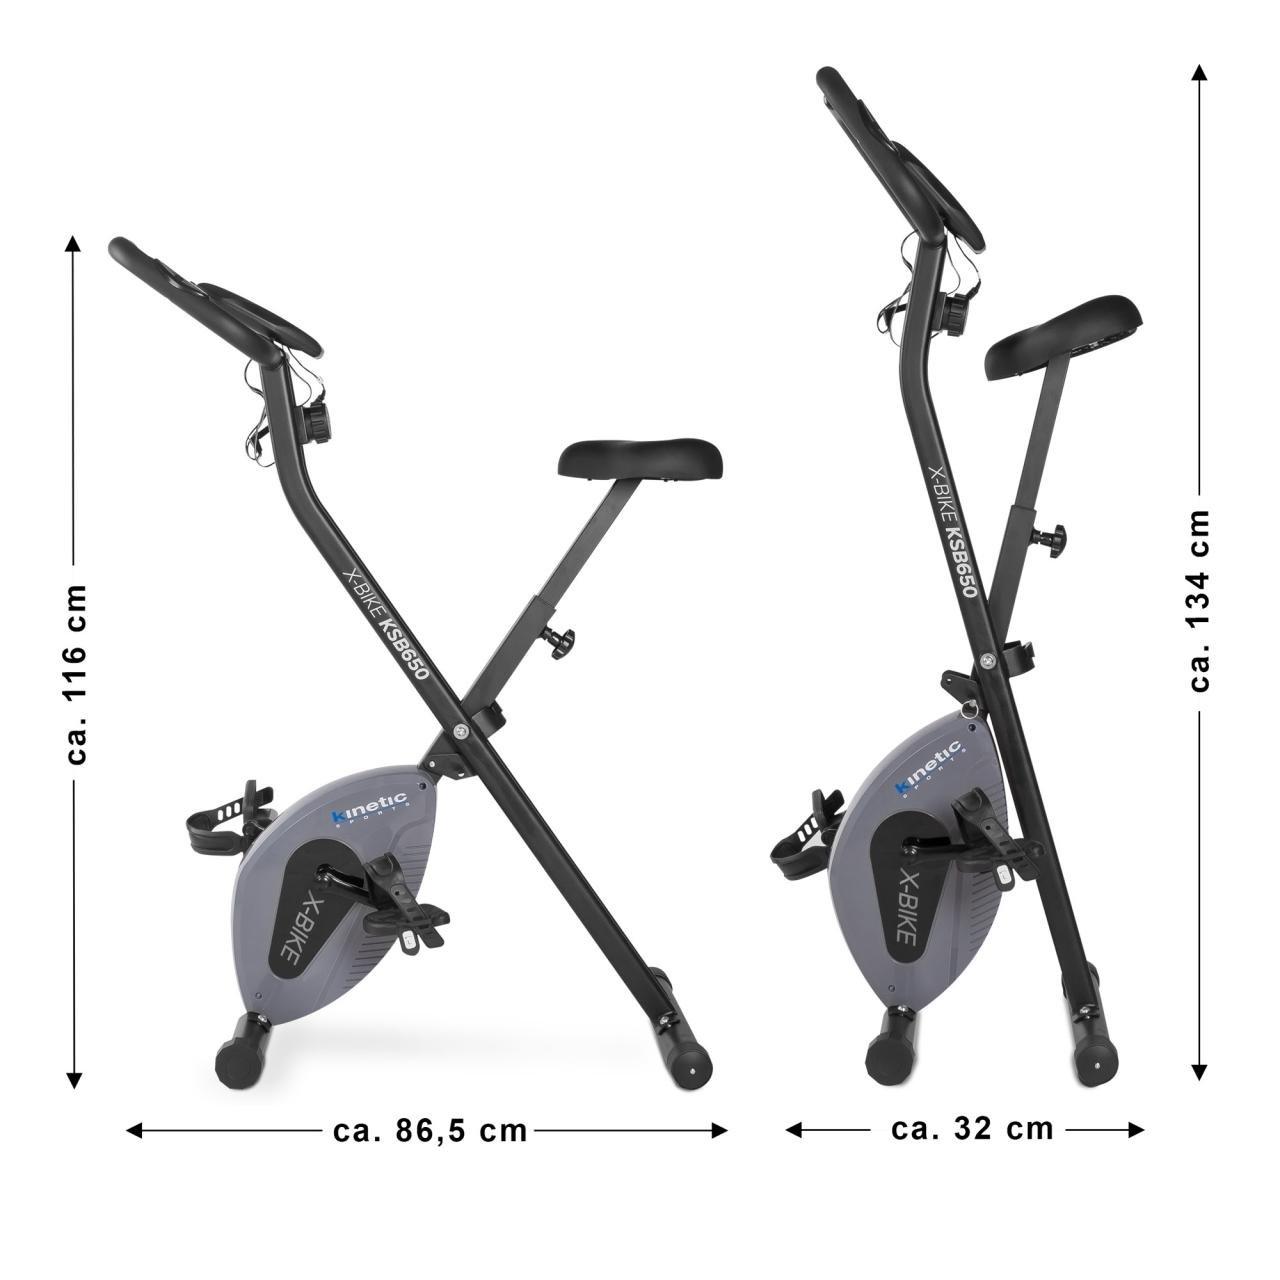 Kinetic Sports Fitnessbike Fitnessfahrrad Ergometer Heimtrainer Hometrainer Fahrrad klappbar Magnetbremssystem Trainingscomputer Handpulssensoren